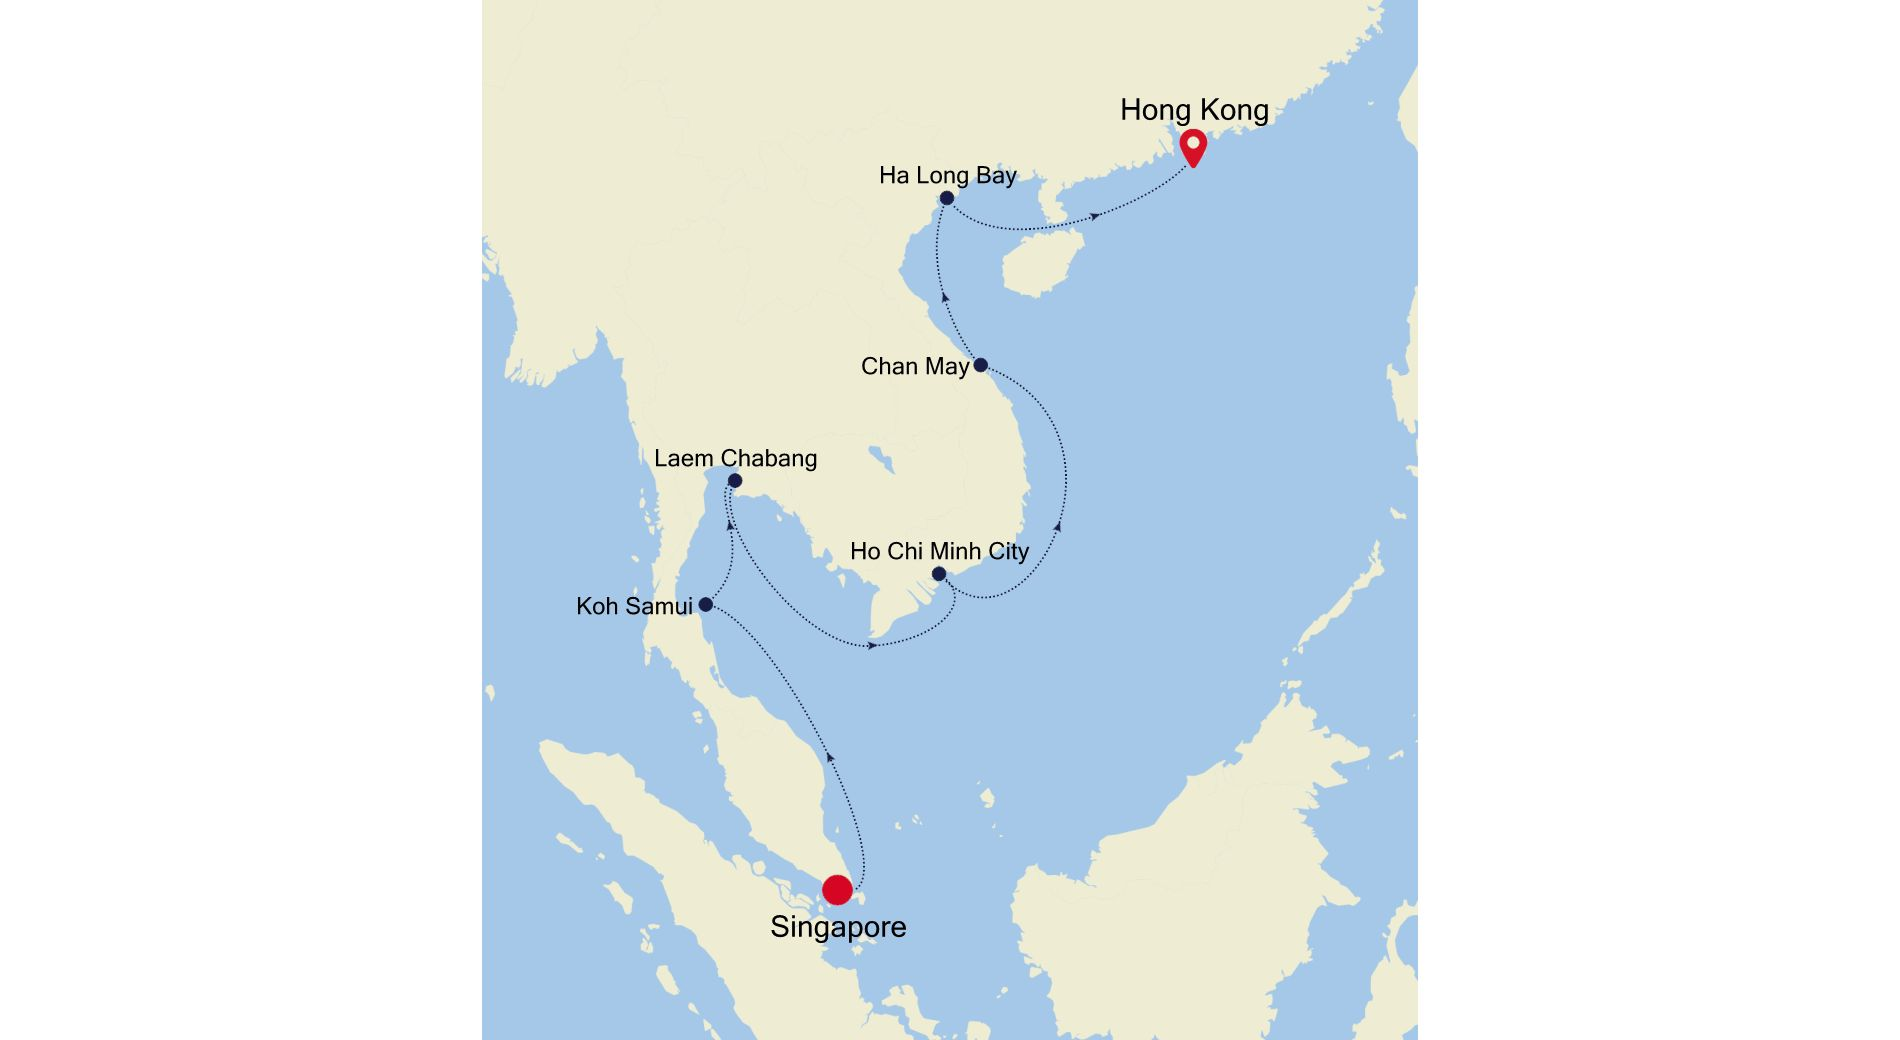 5001 - Singapore a Hong Kong